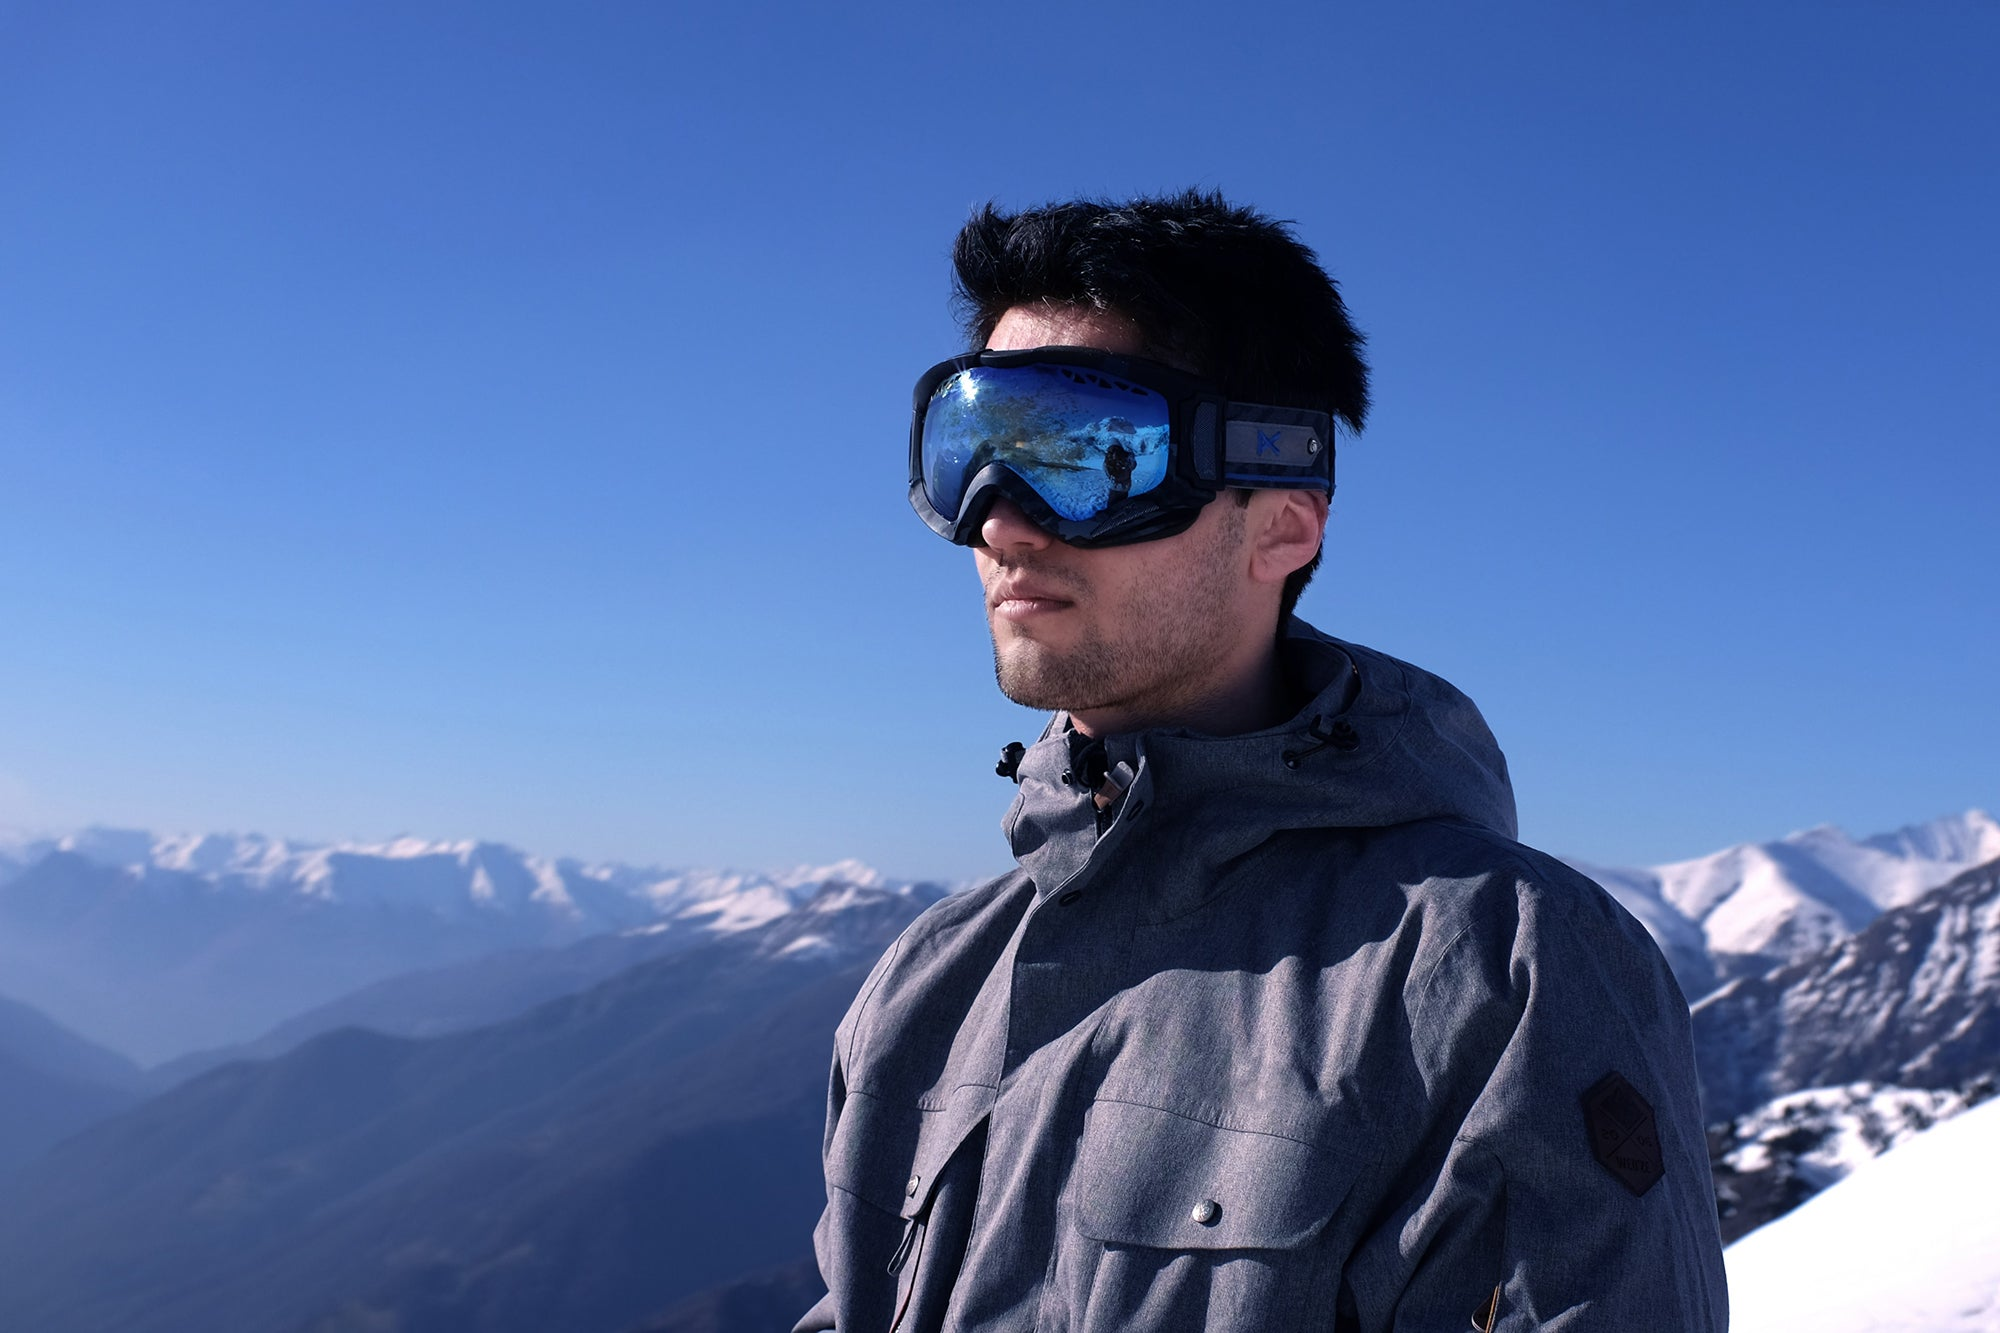 man wearing ski goggles on a mountain